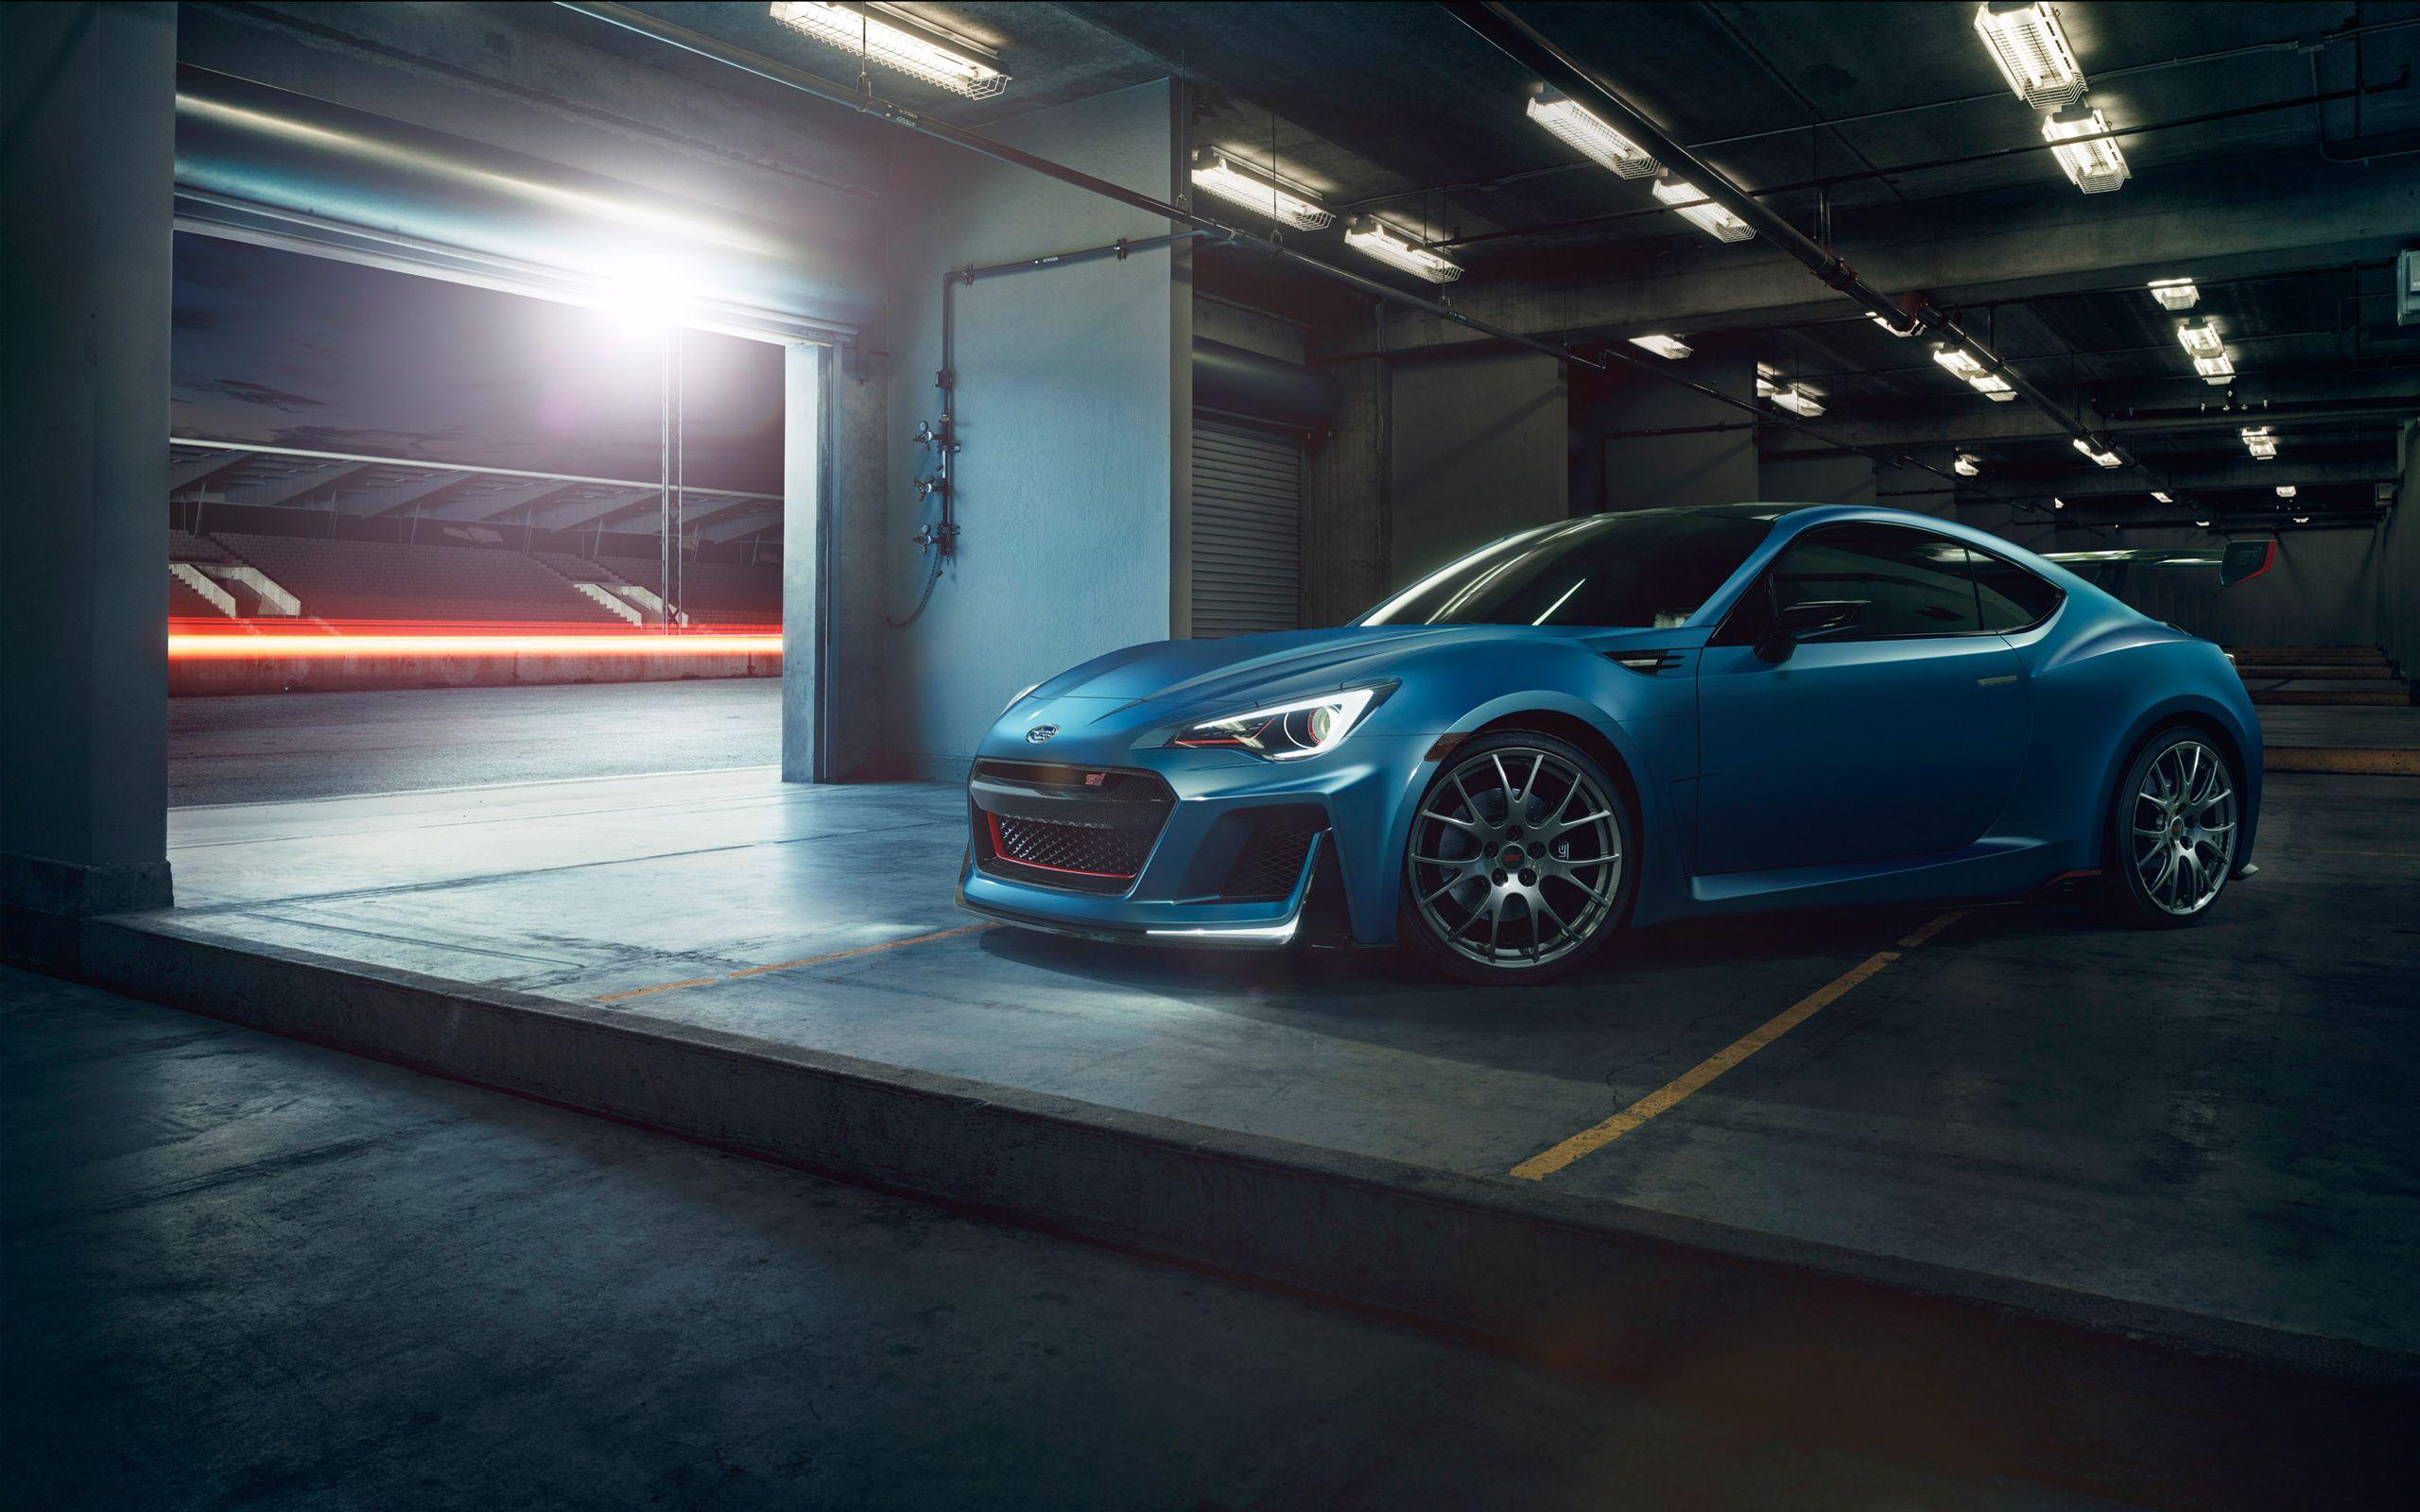 2015 Subaru STi Performance Concept 3 Car - http://www.fullhdwpp.com/transportation/cars/2015-subaru-sti-performance-concept-3-car/